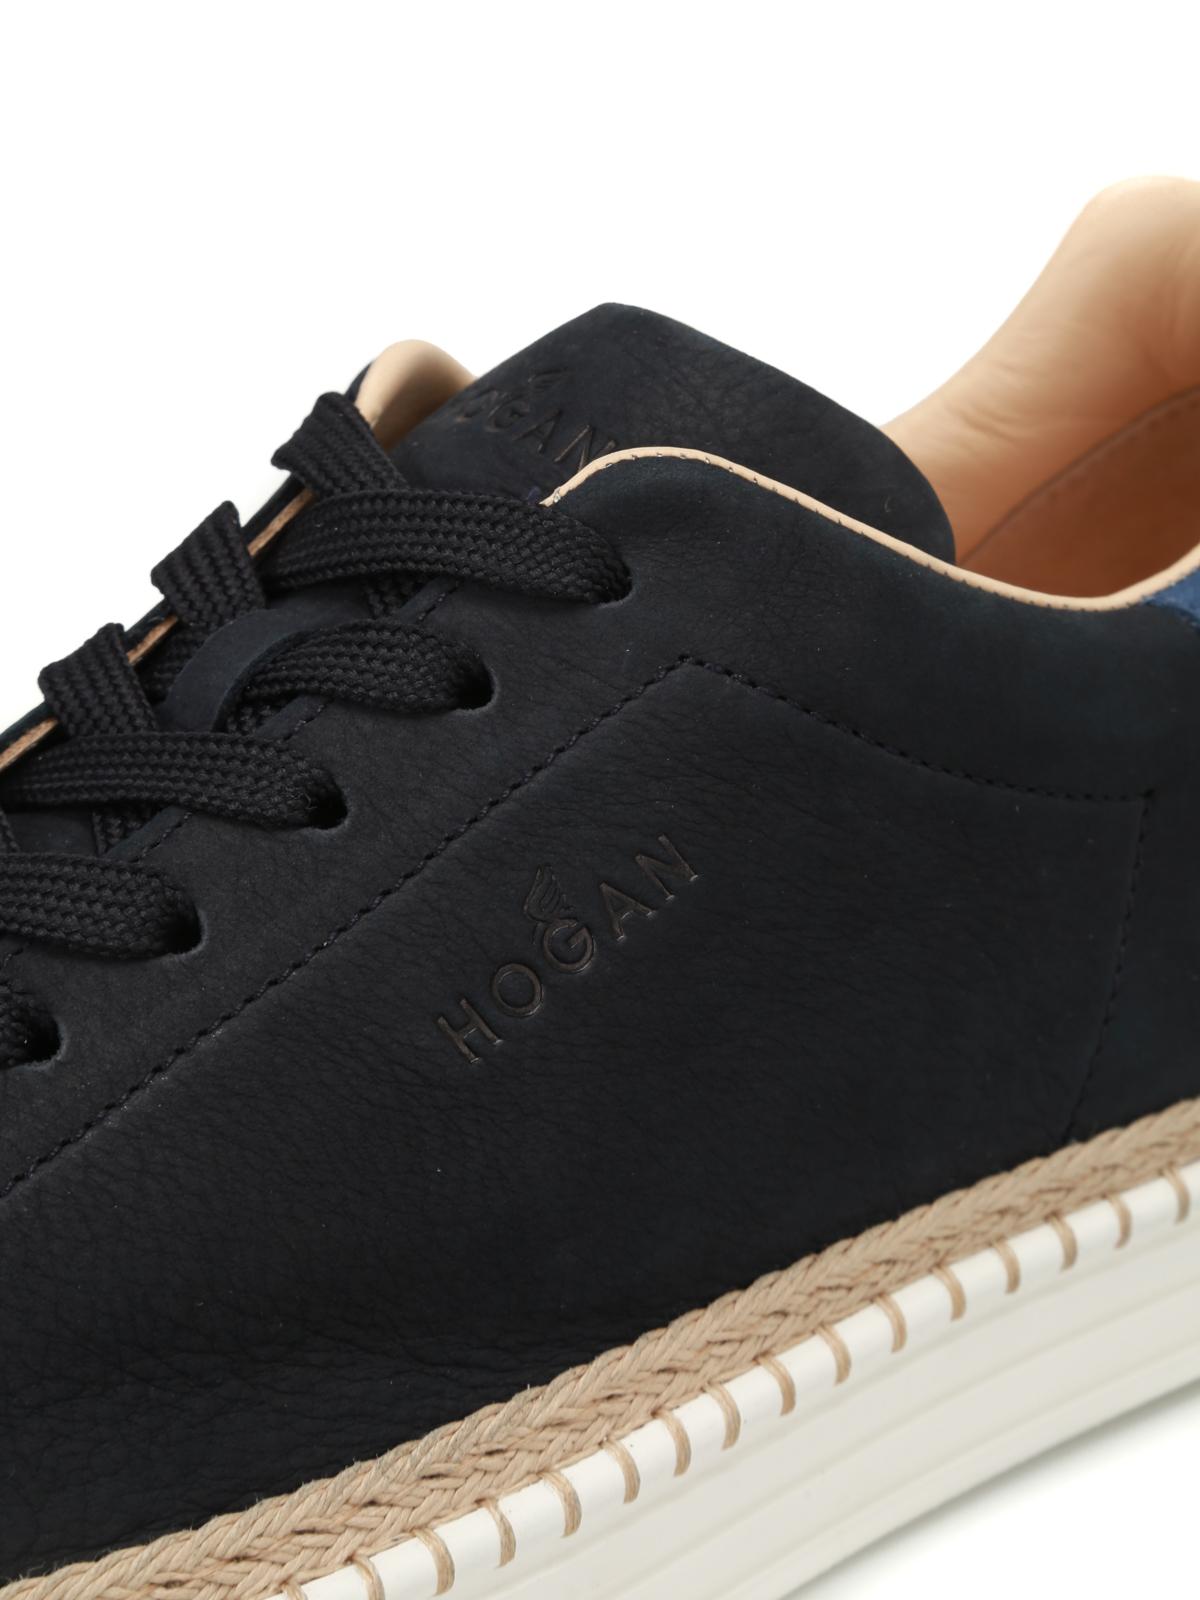 Sneakers Hogan - Sneaker R260 in pelle blu scura - HXM2600AD506RN669E